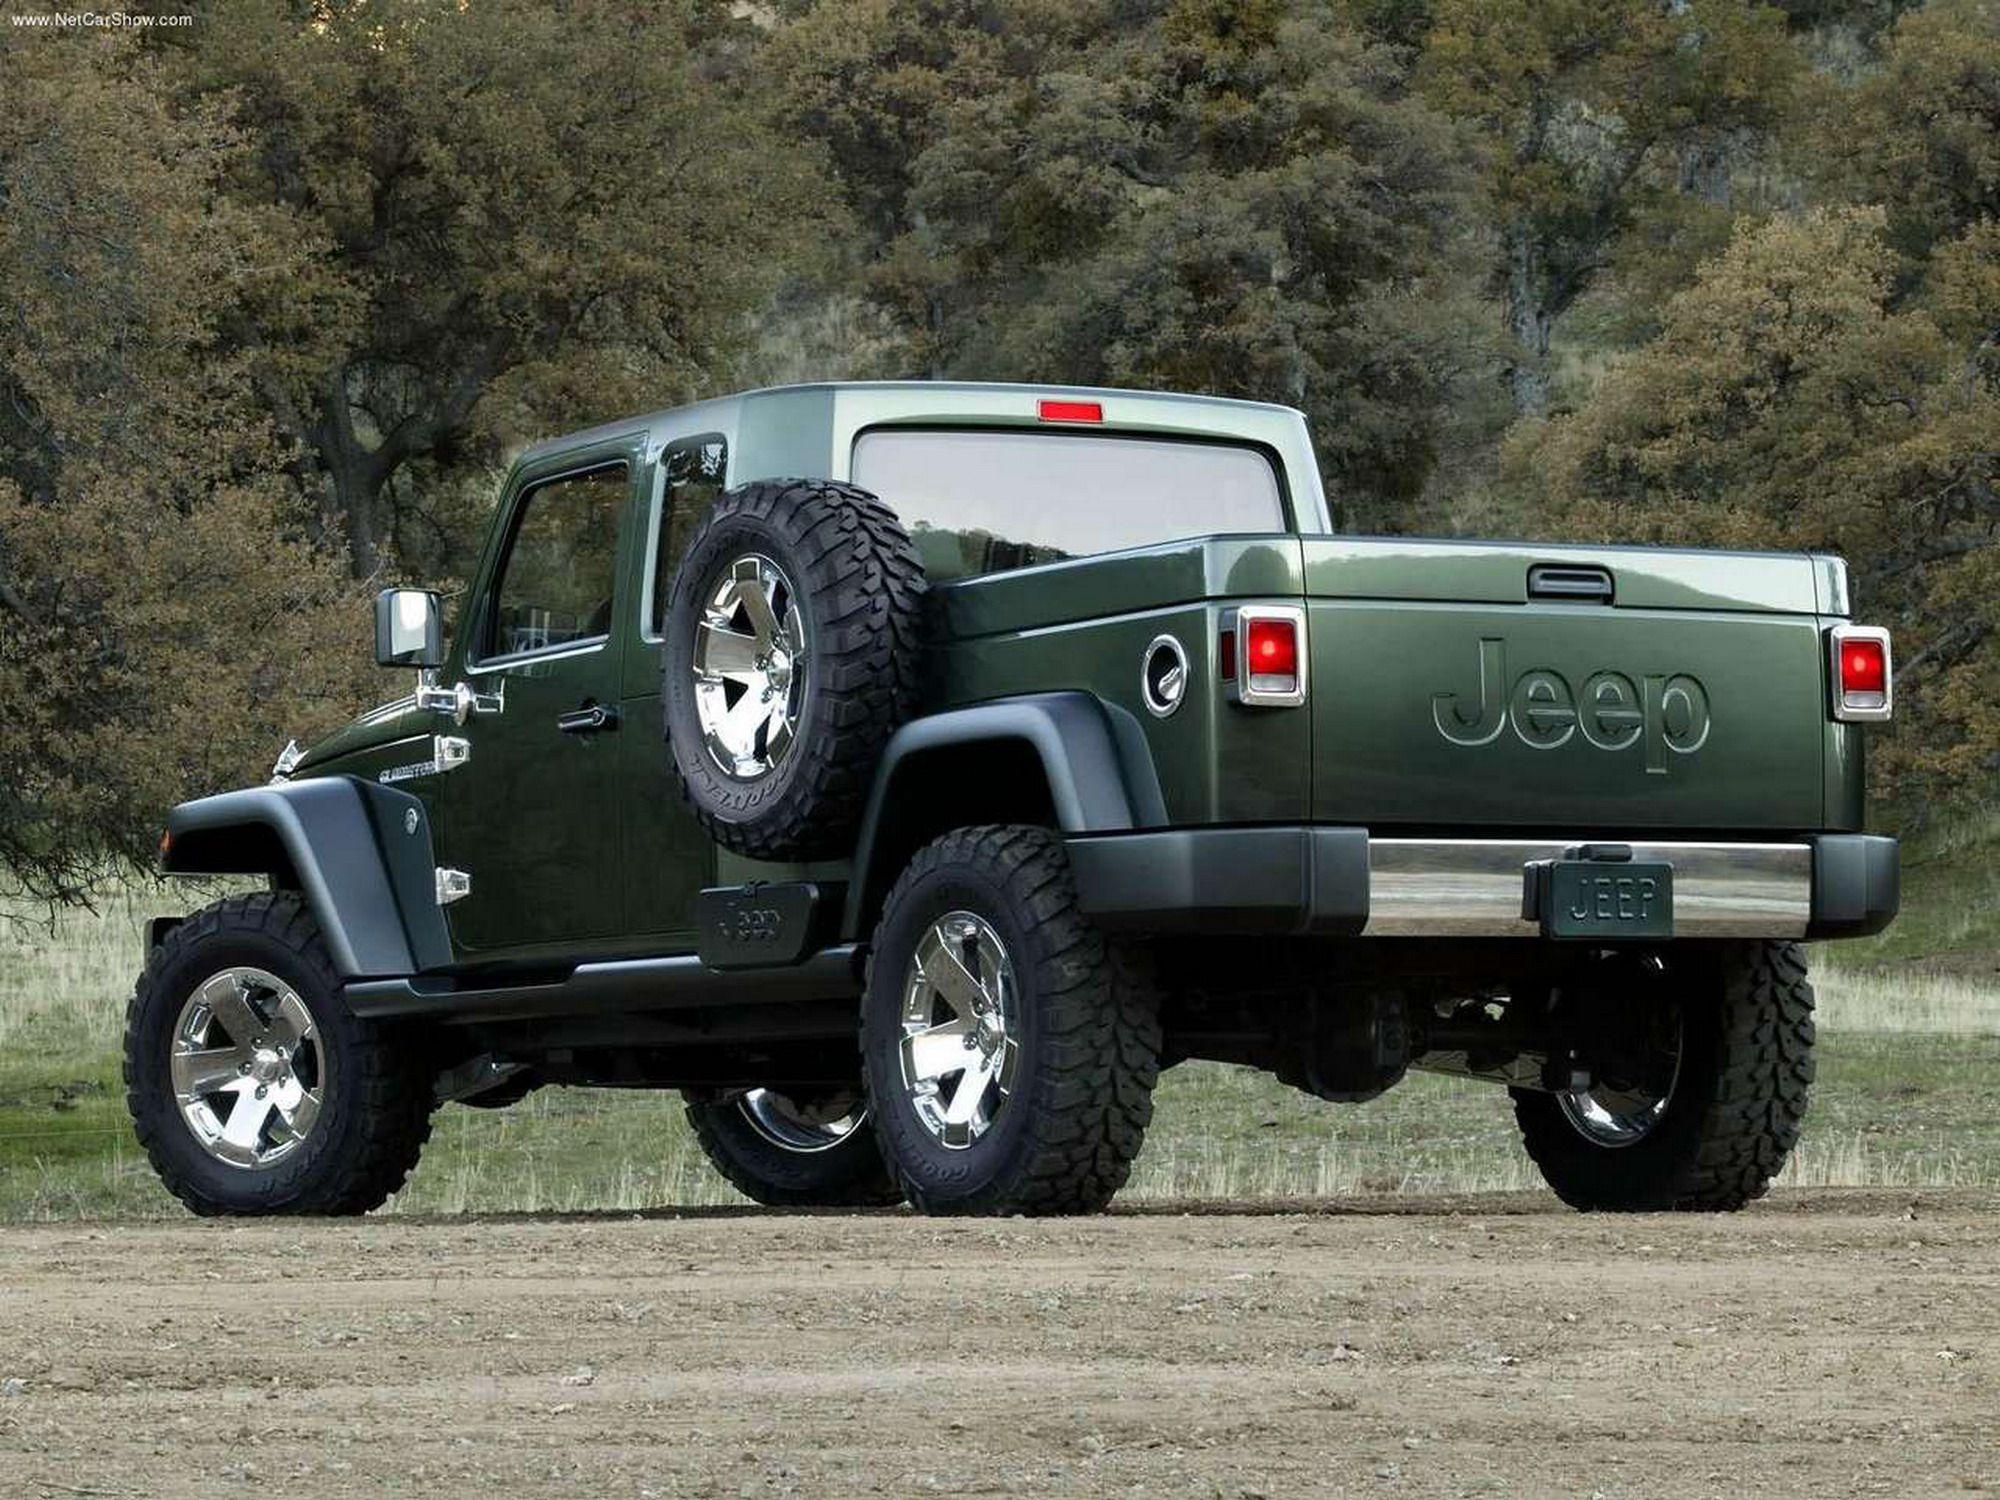 2005 Jeep Gladiator Cars trucks & motorcycles Pinterest